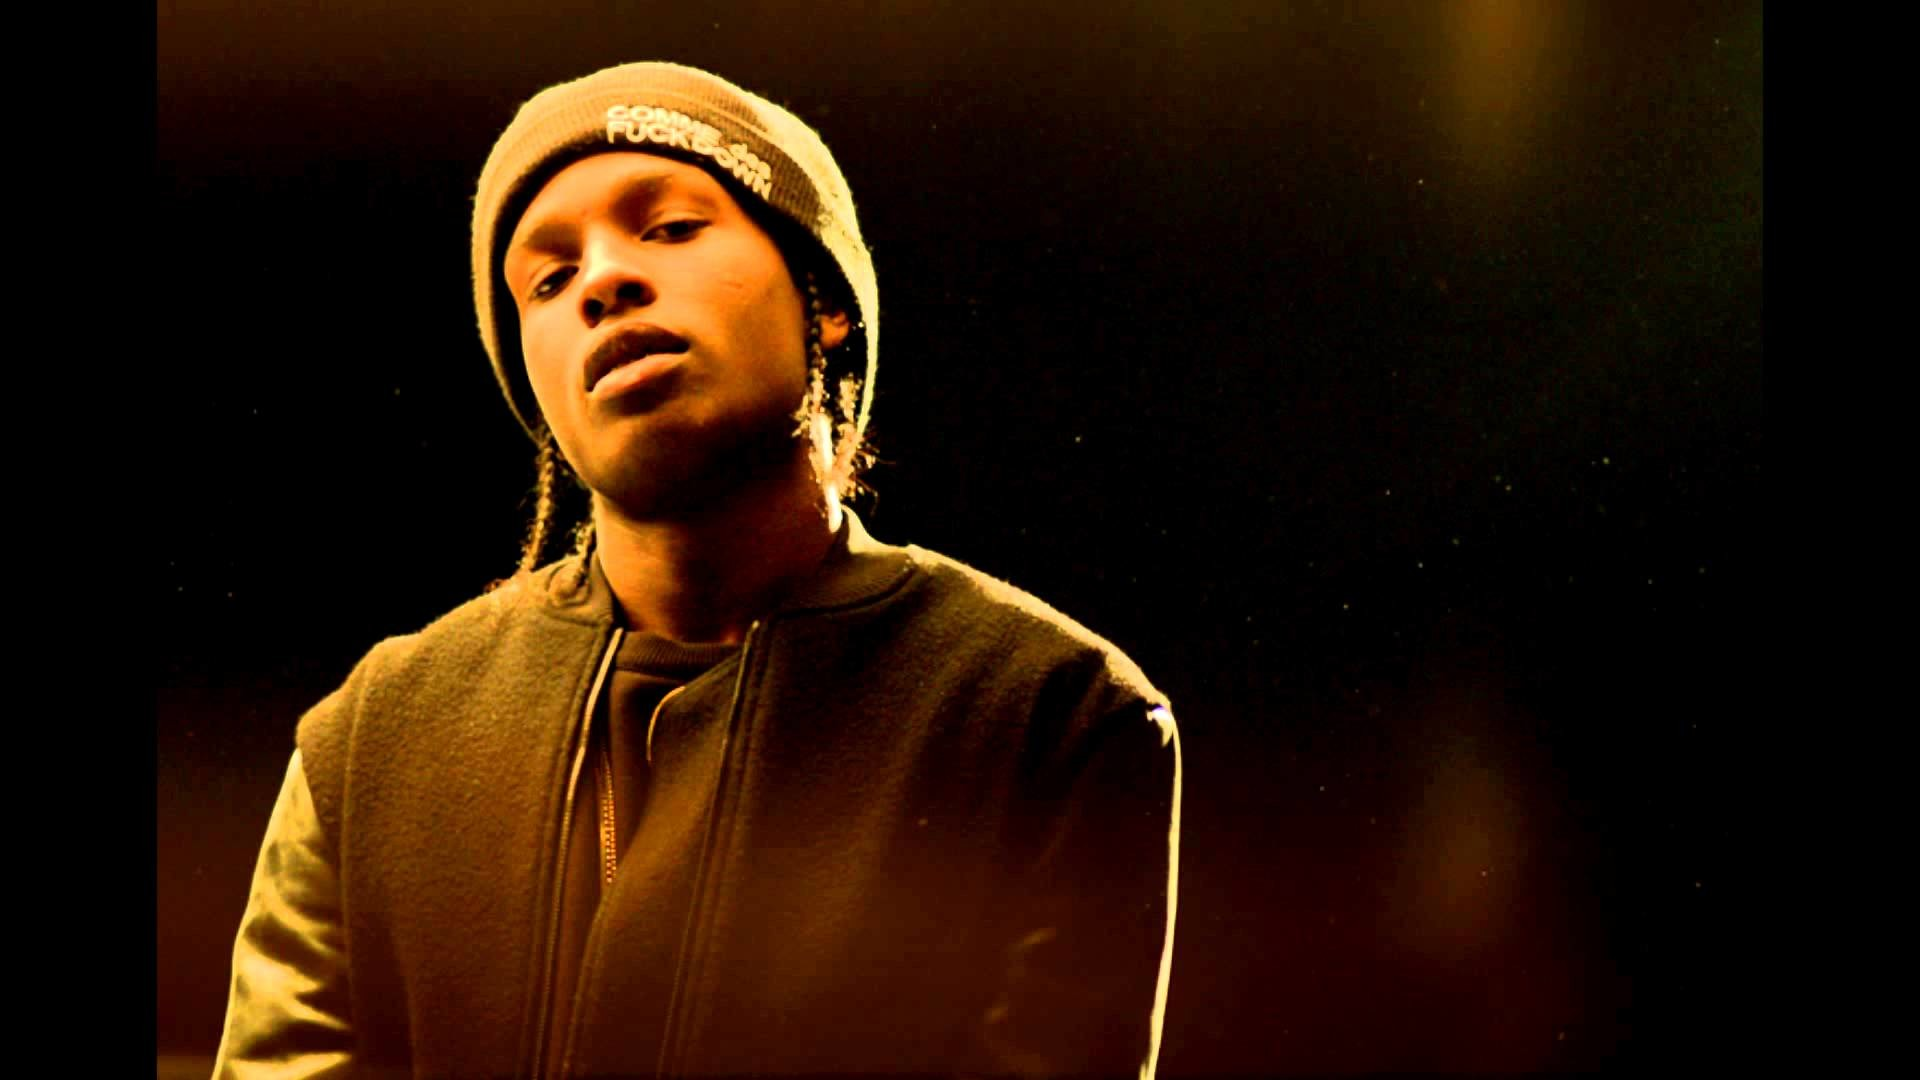 ASAP Rocky-Rap Instrumental (From new album) 2015